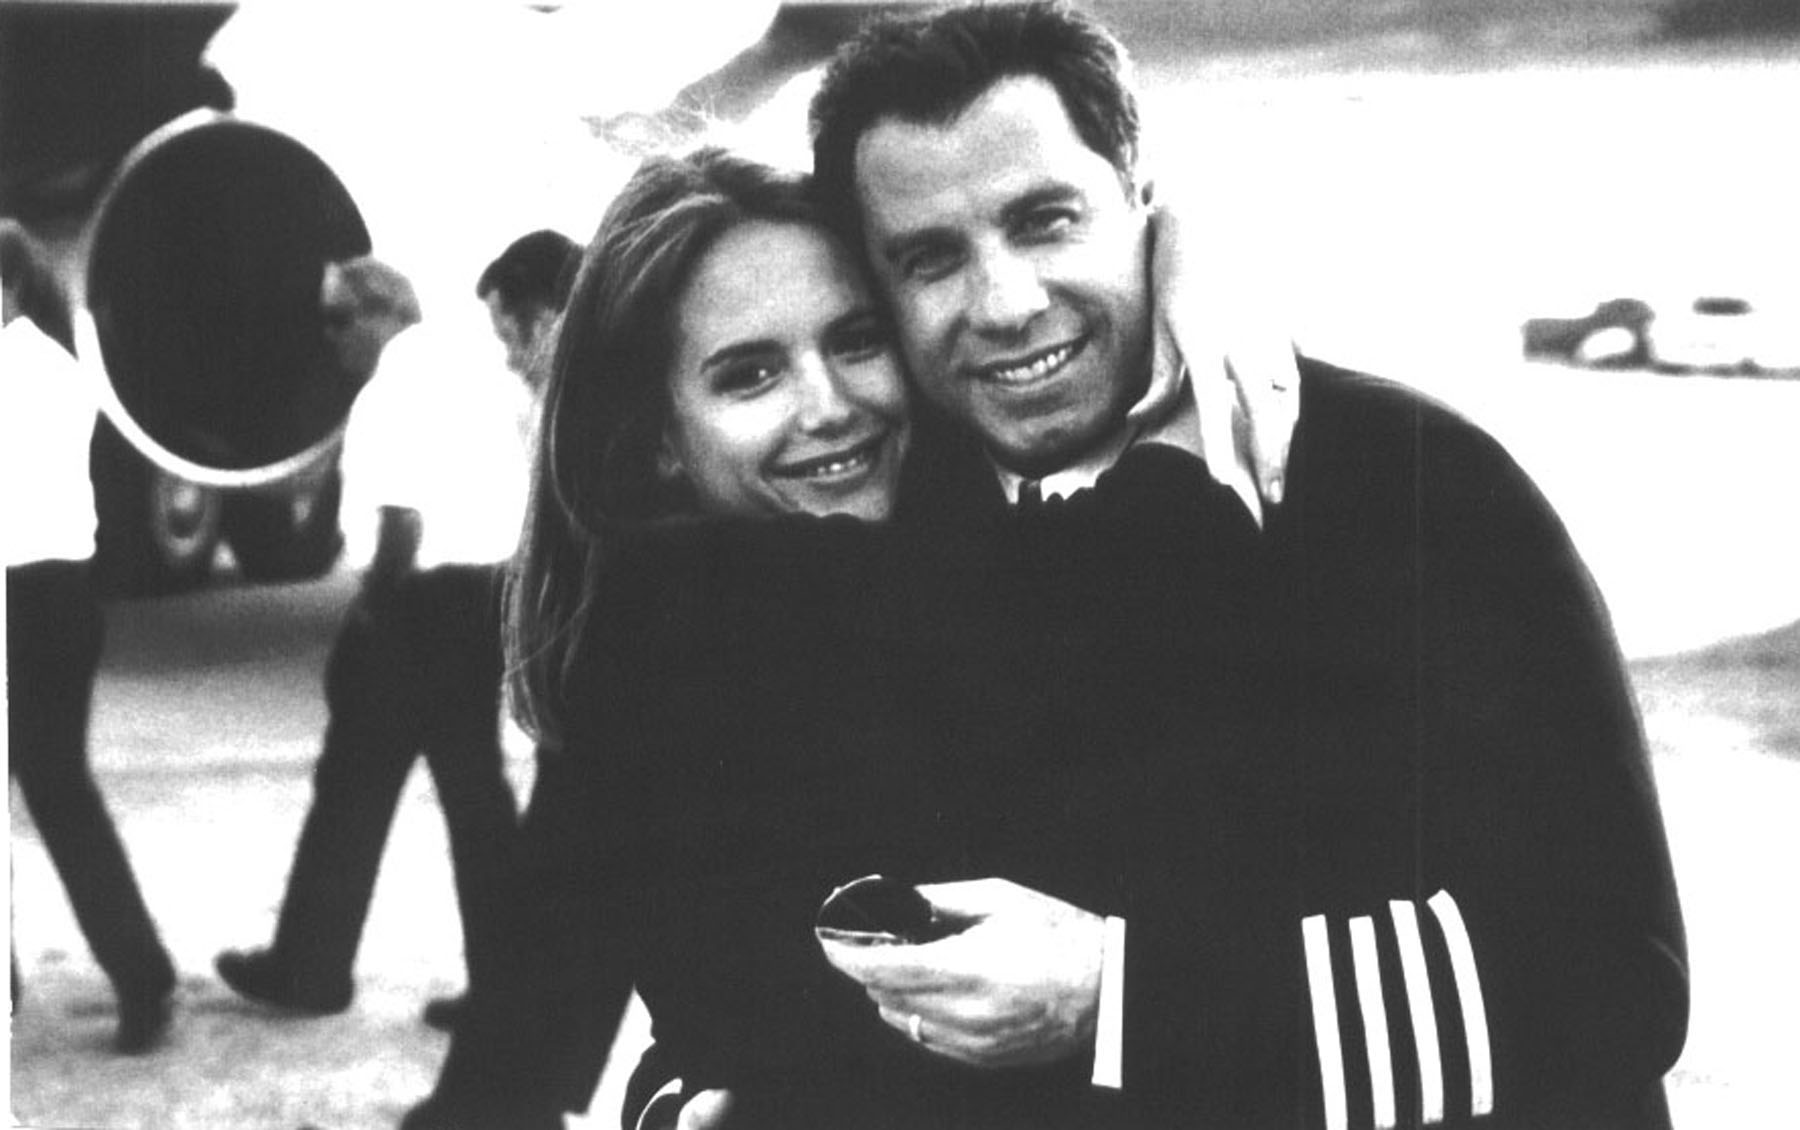 John travolta and kelly preston 1991